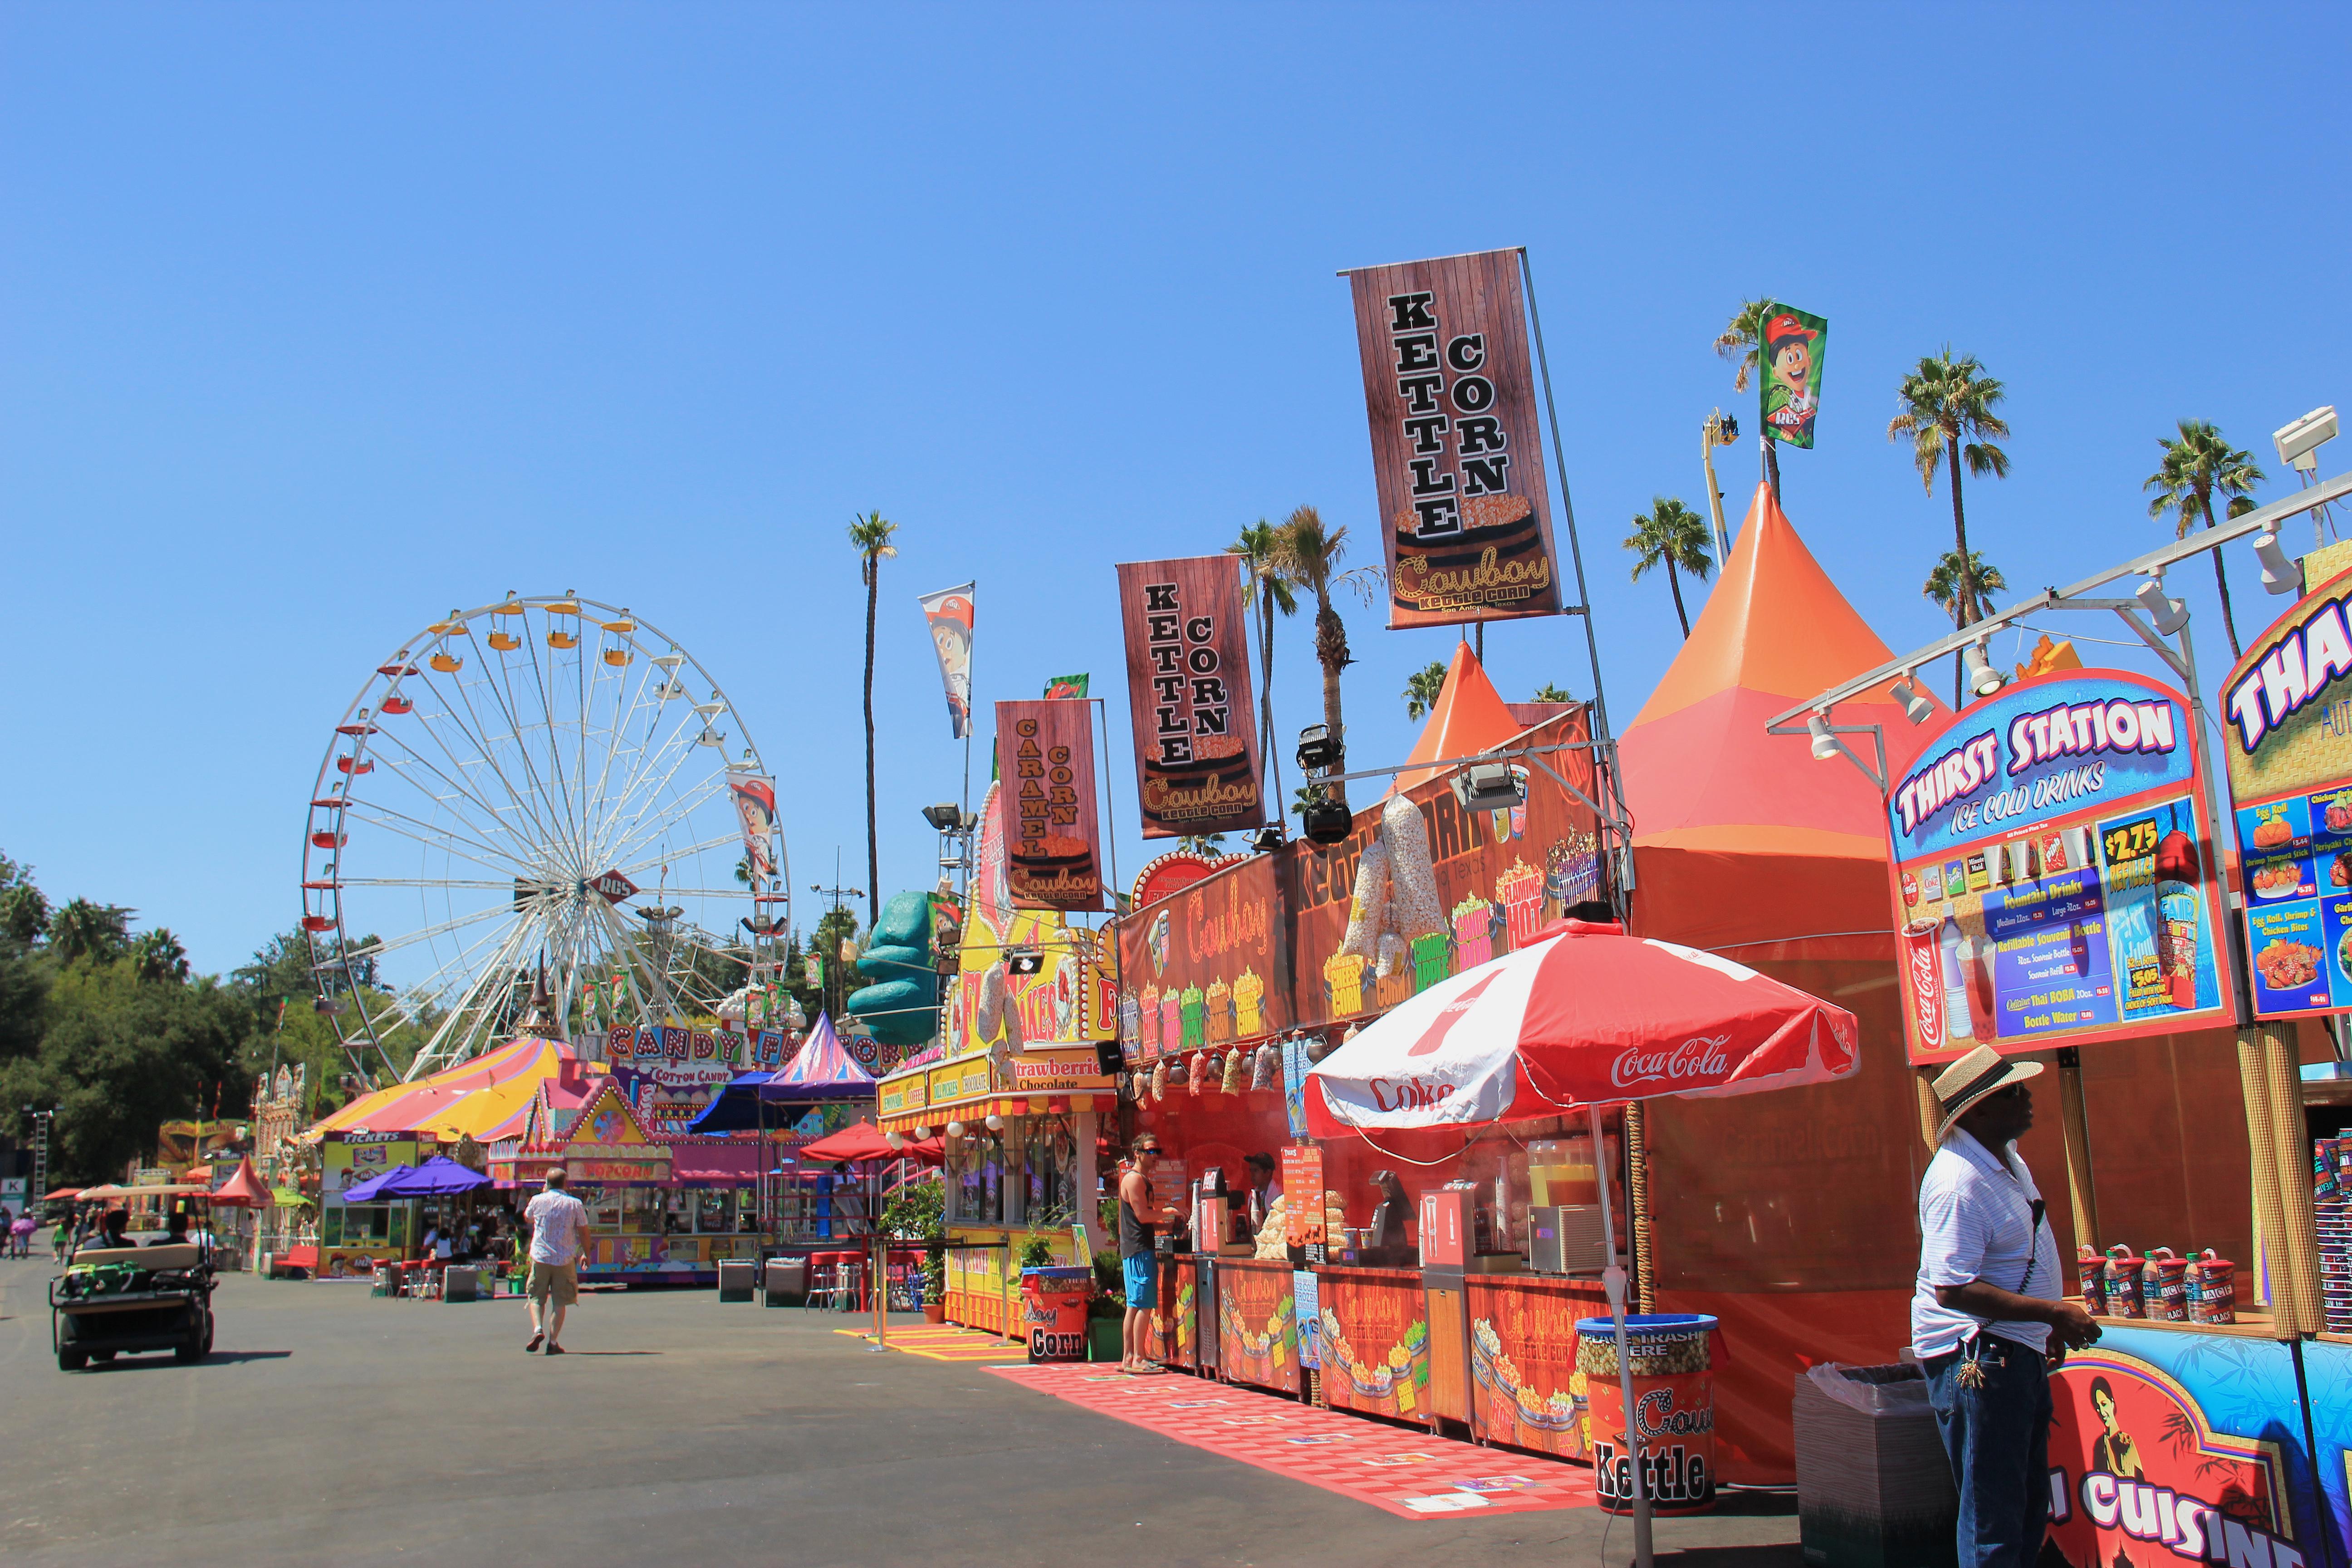 Vendros at LA County Fair